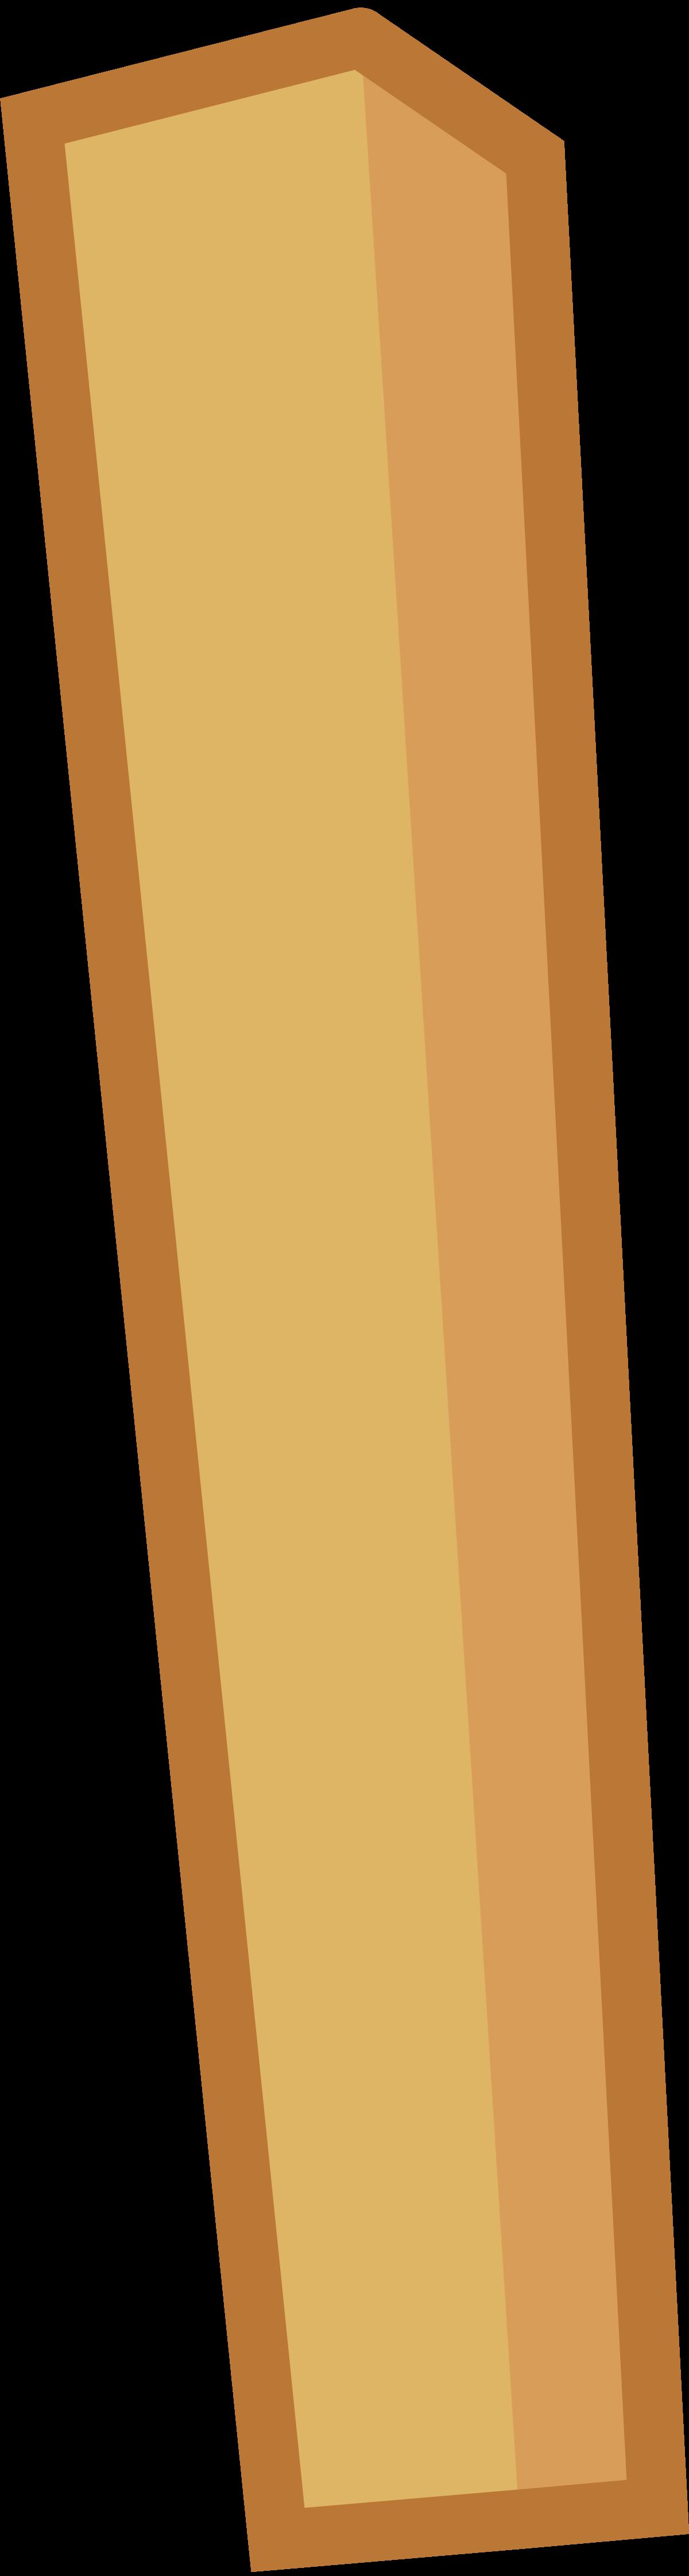 Single Fry